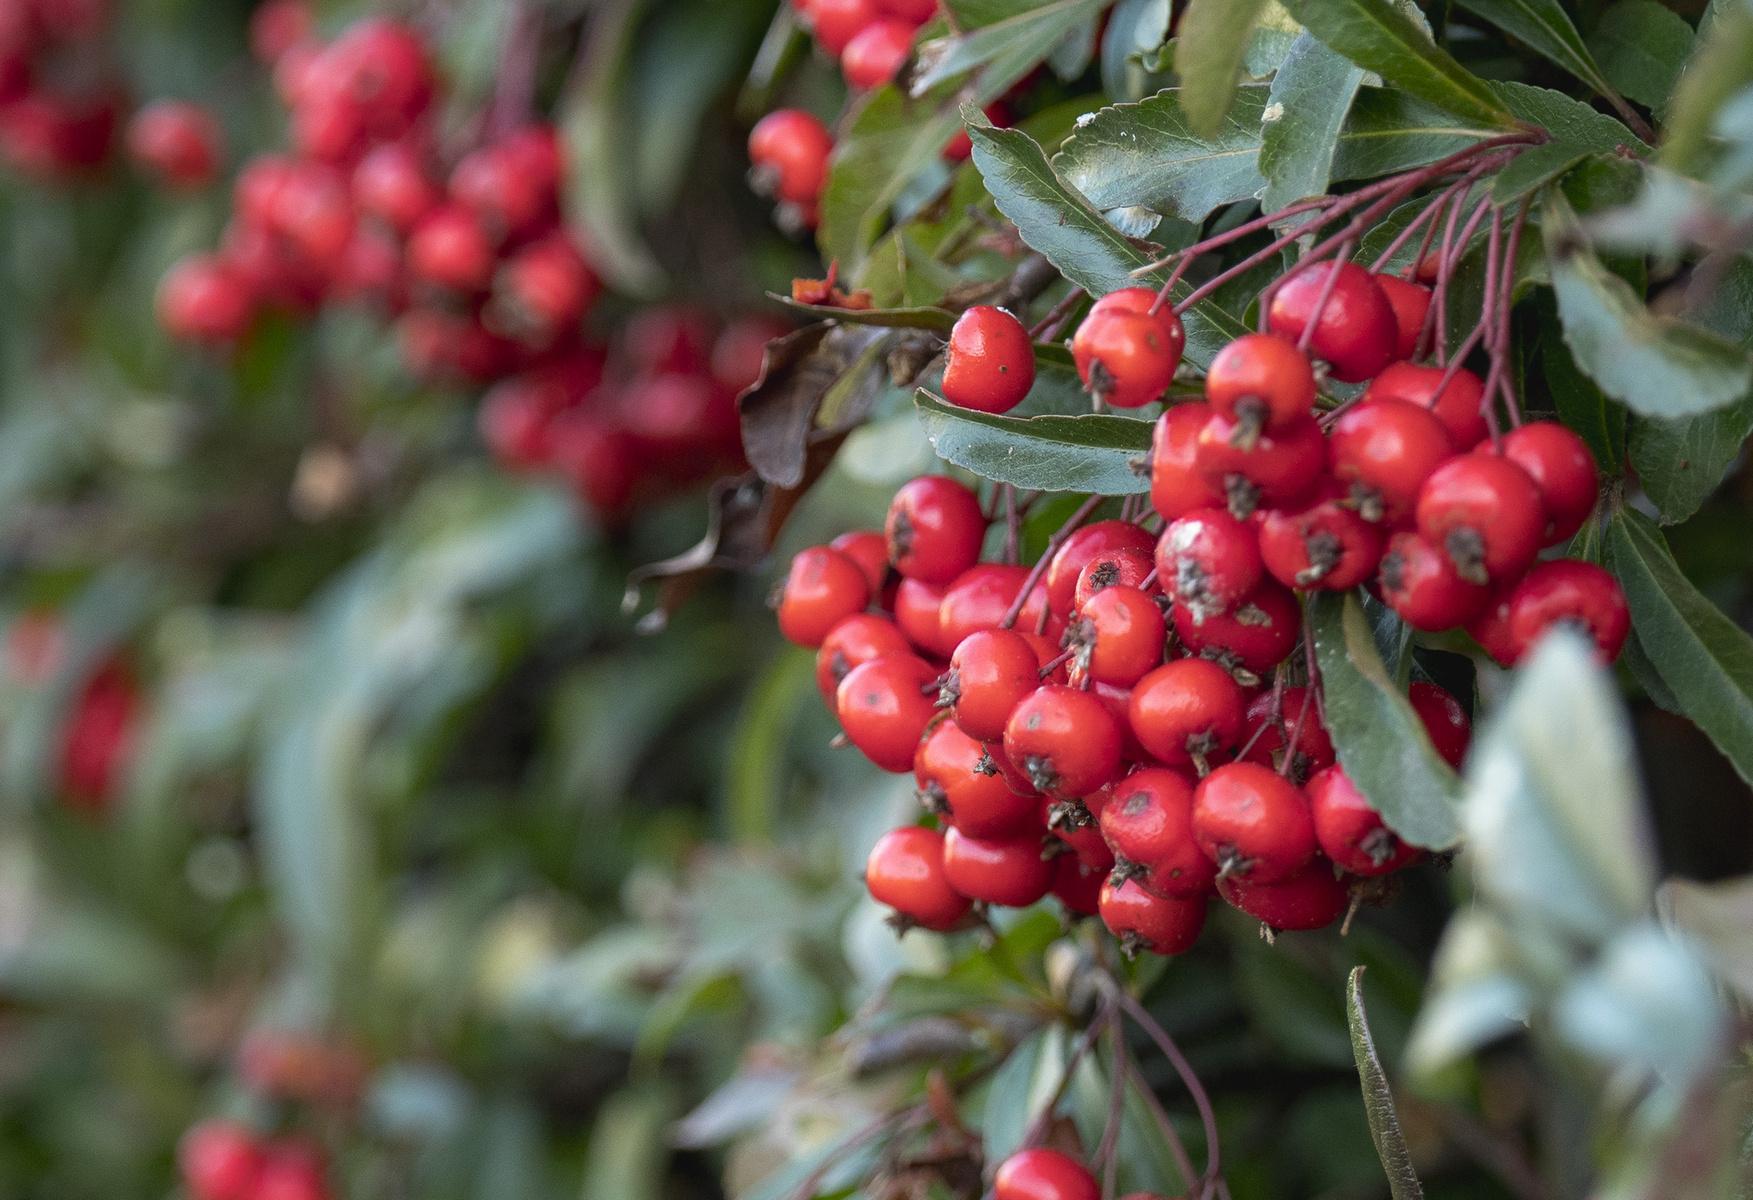 bushels of berries